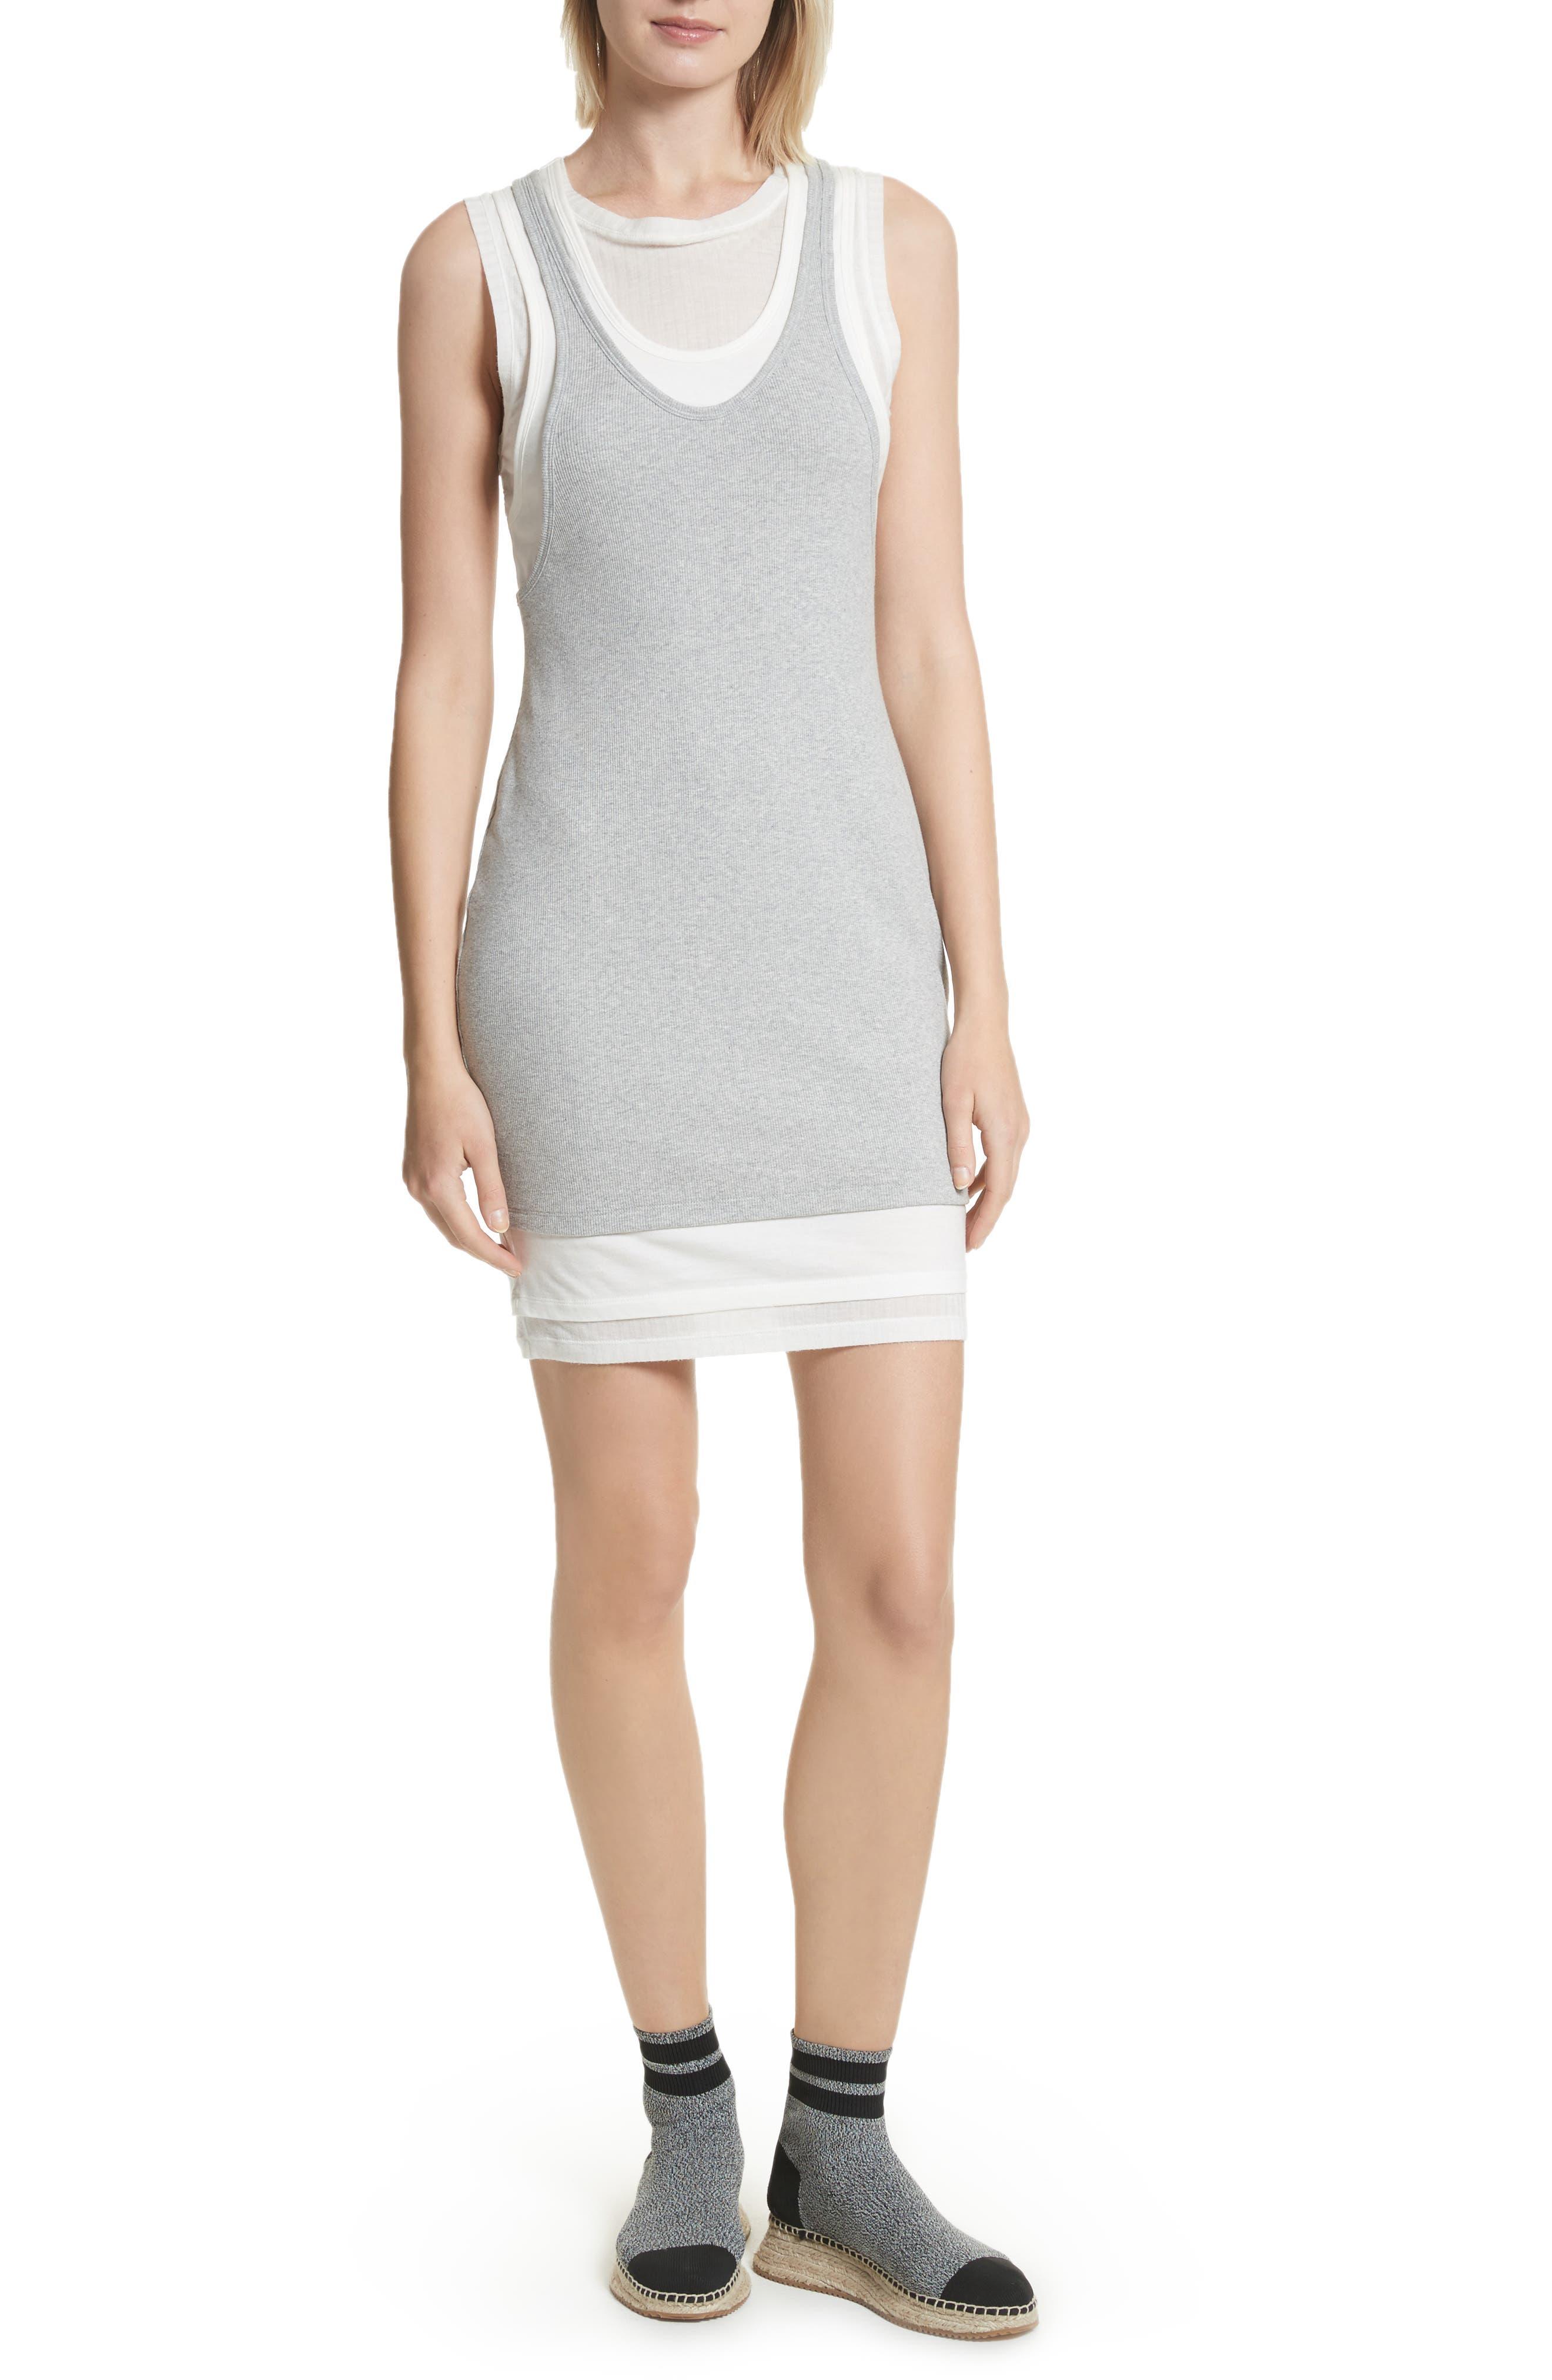 Alexander Wang Layered Mixed Media Dress,                         Main,                         color, Heather Grey Off White